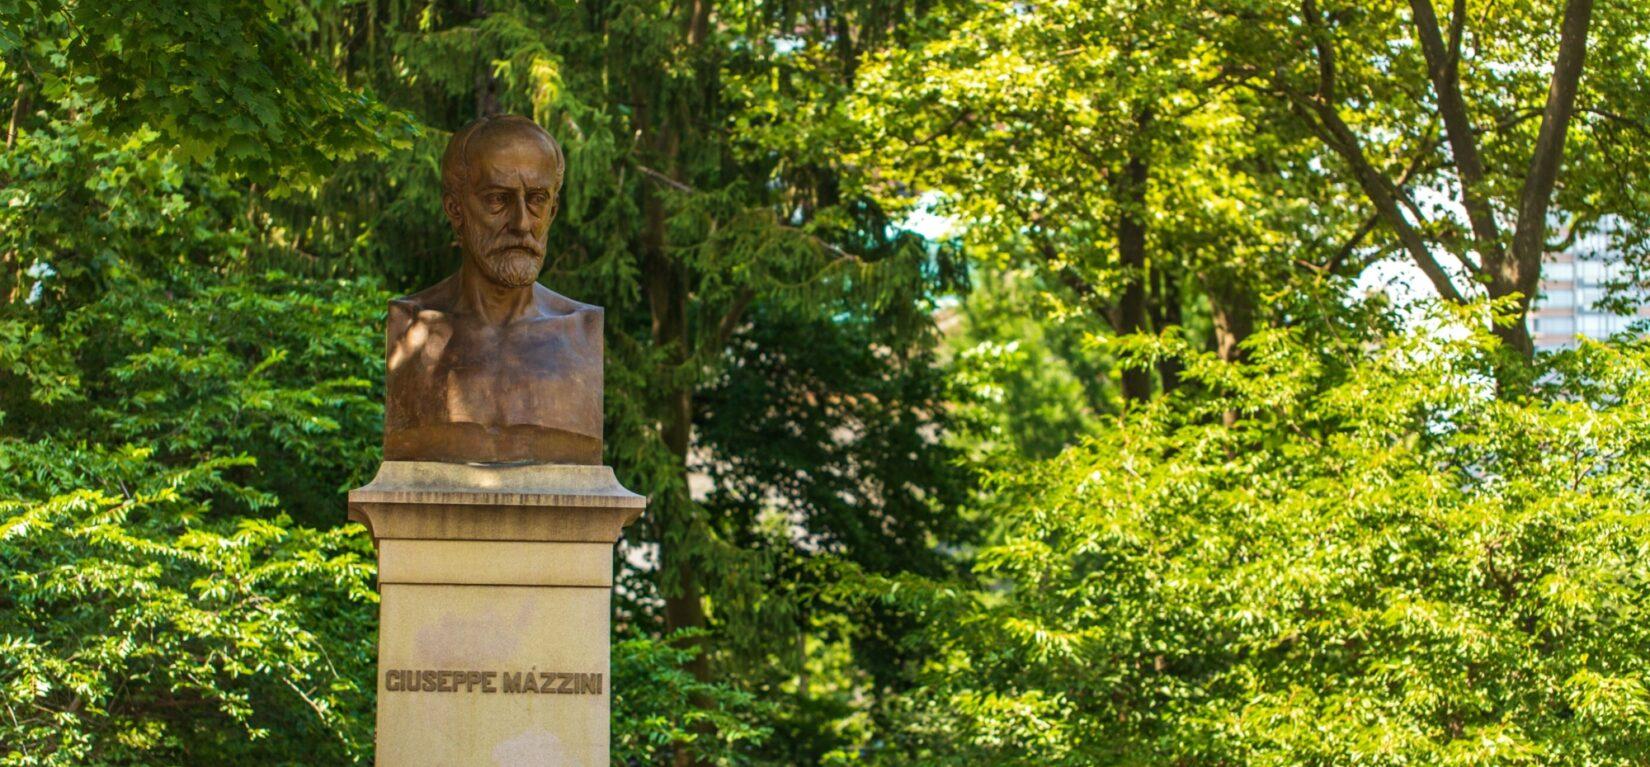 The bust of Giuseppe Mazzini on its pedastal under dappled shade